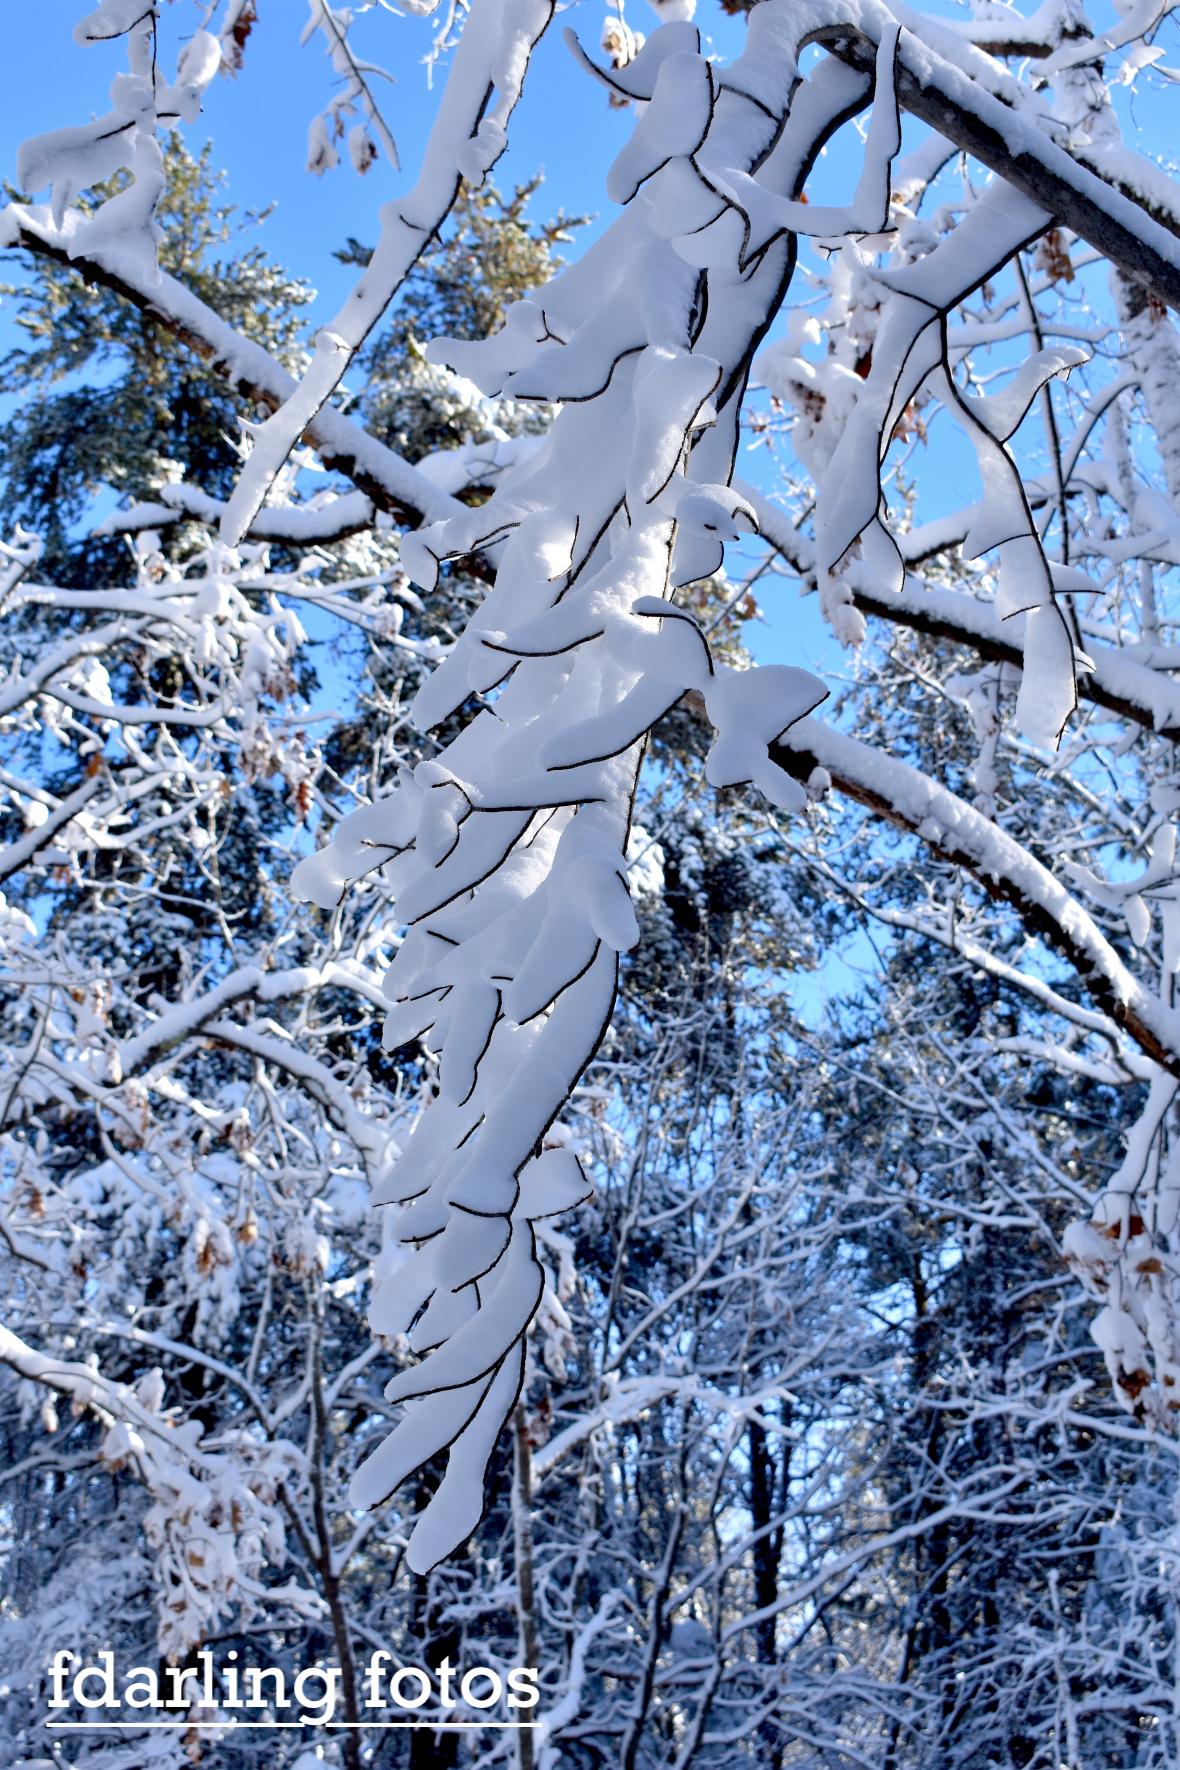 snowybranchhanging_0004